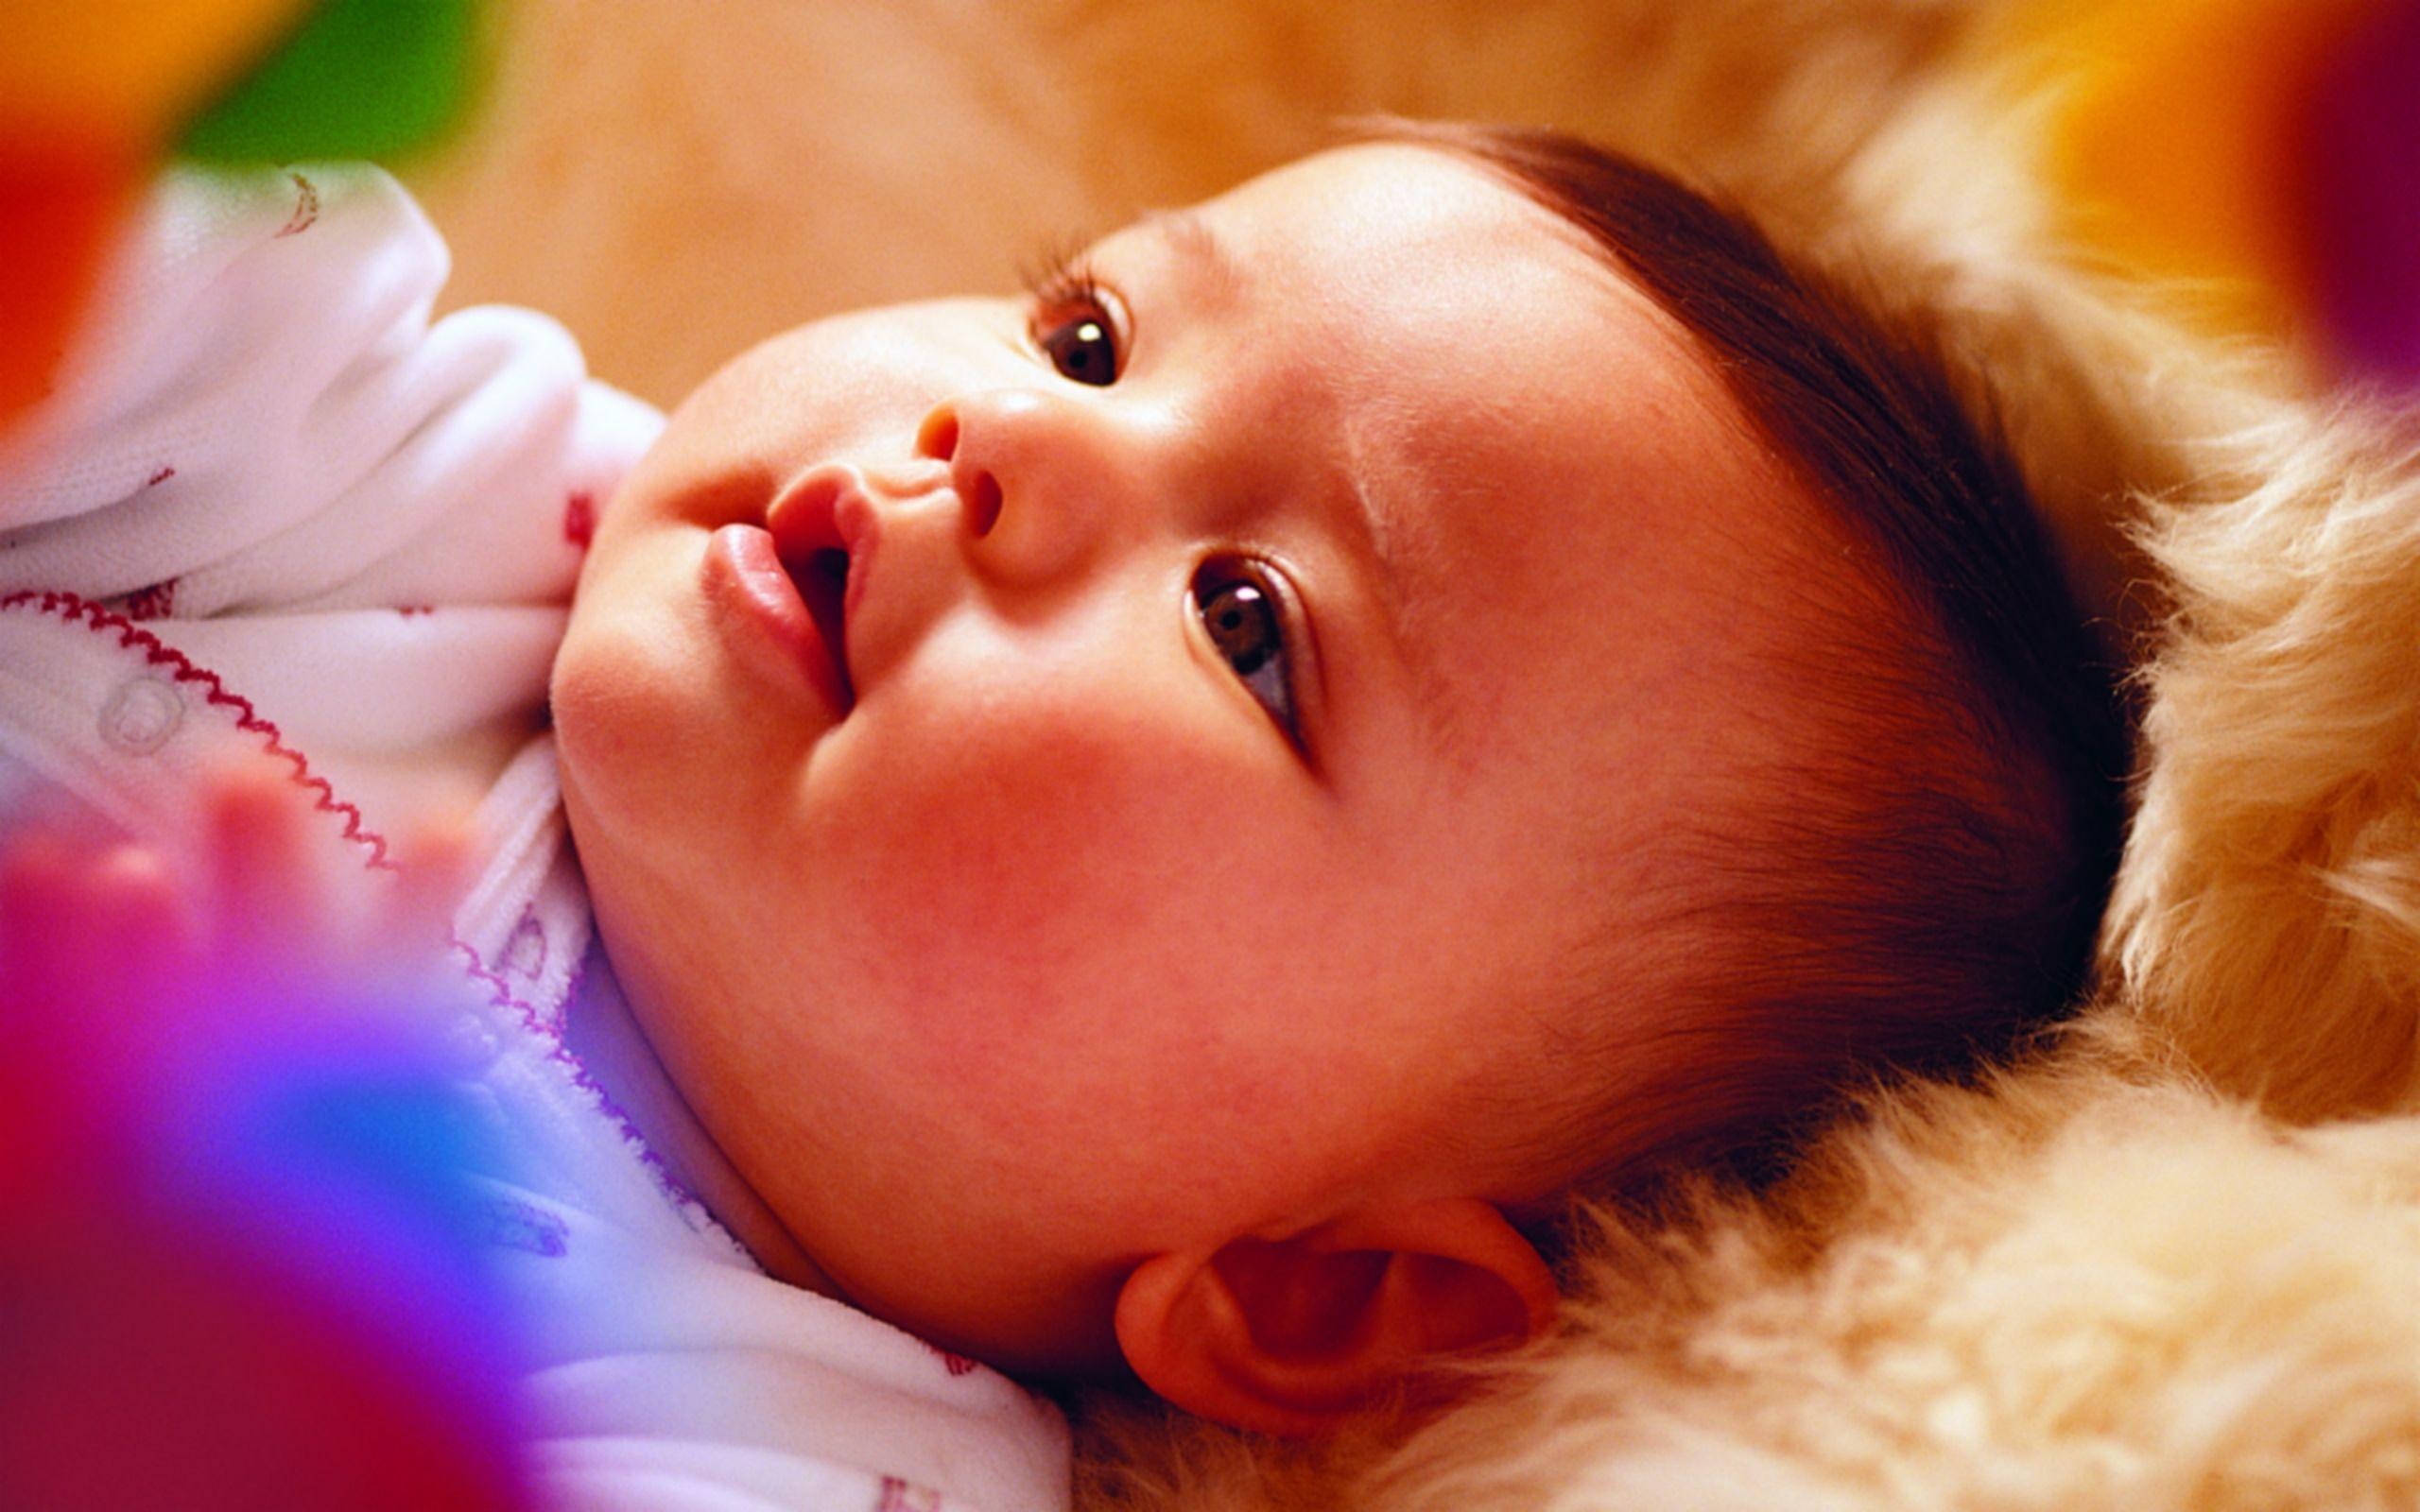 Wallpaper download cute - Cute Baby 51 Wallpapers Hd Wallpapers